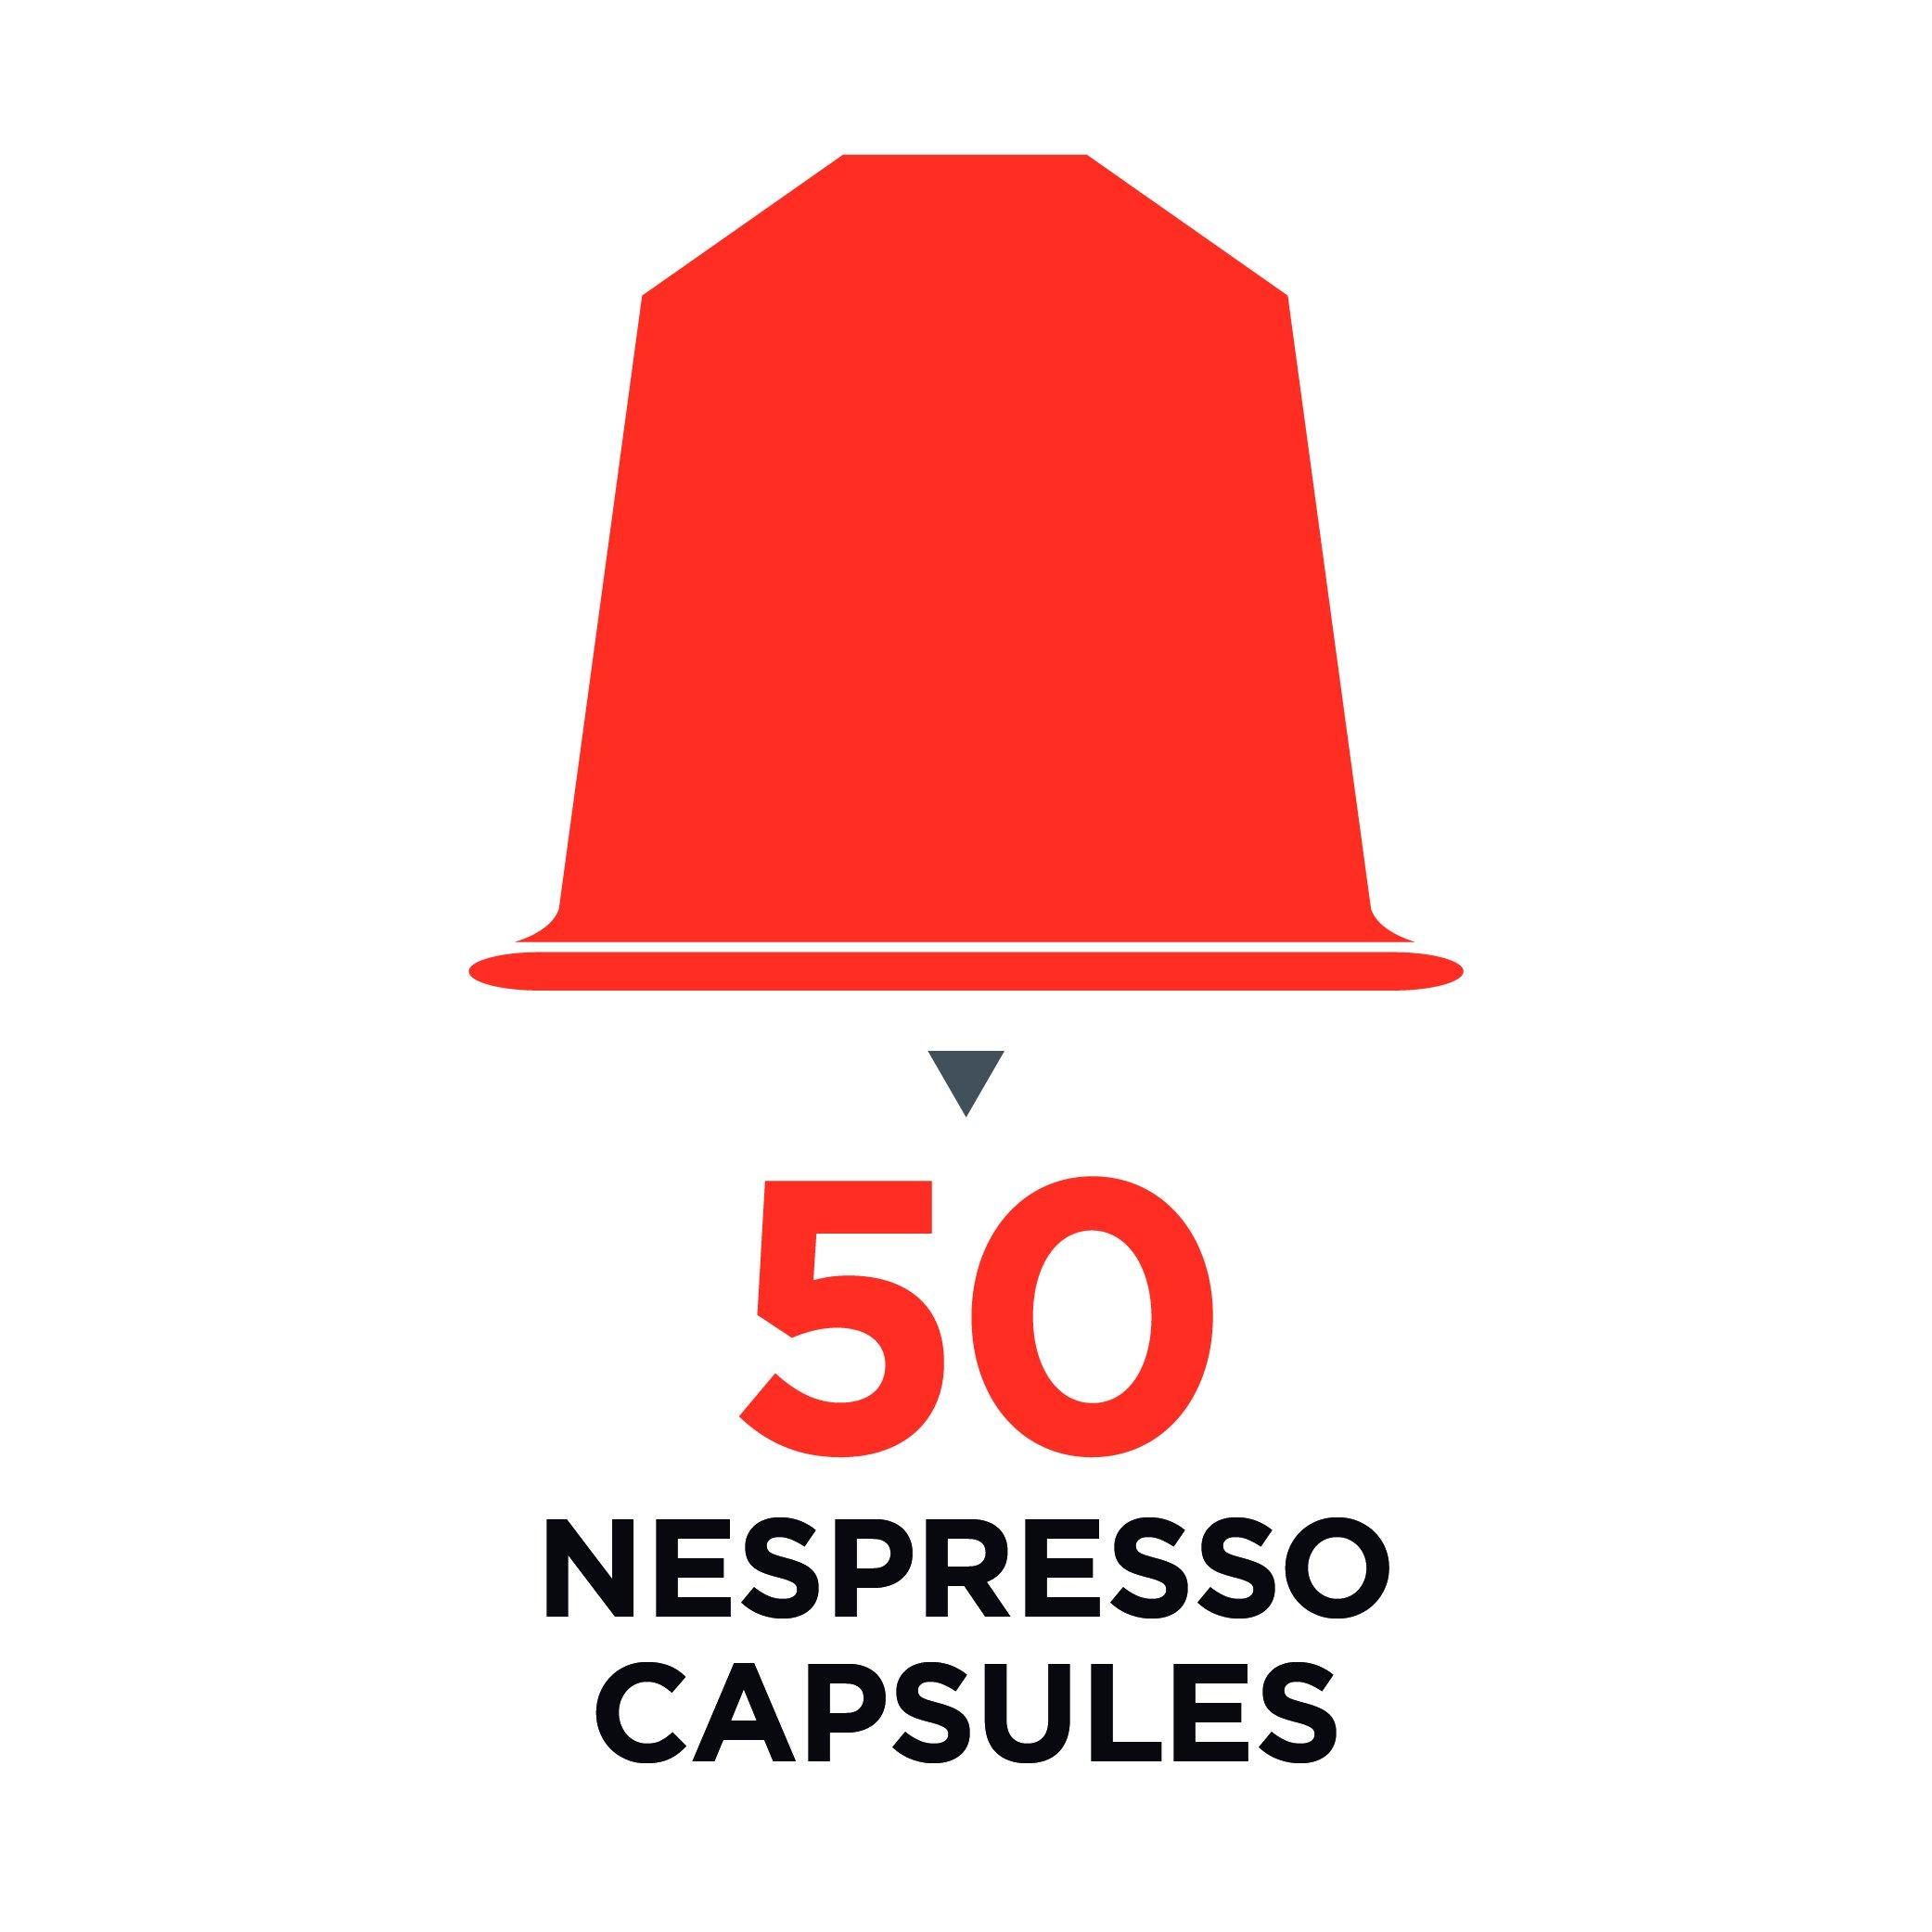 BluePeak Nespresso Coffee Capsule Rack Holder Carousel - Holds 50 Capsules OriginalLine. Elegant and Modern Chrome Finish. 360-degree Rotation. For Citiz, Pixie & Latissima Machines by BluePeak (Image #4)